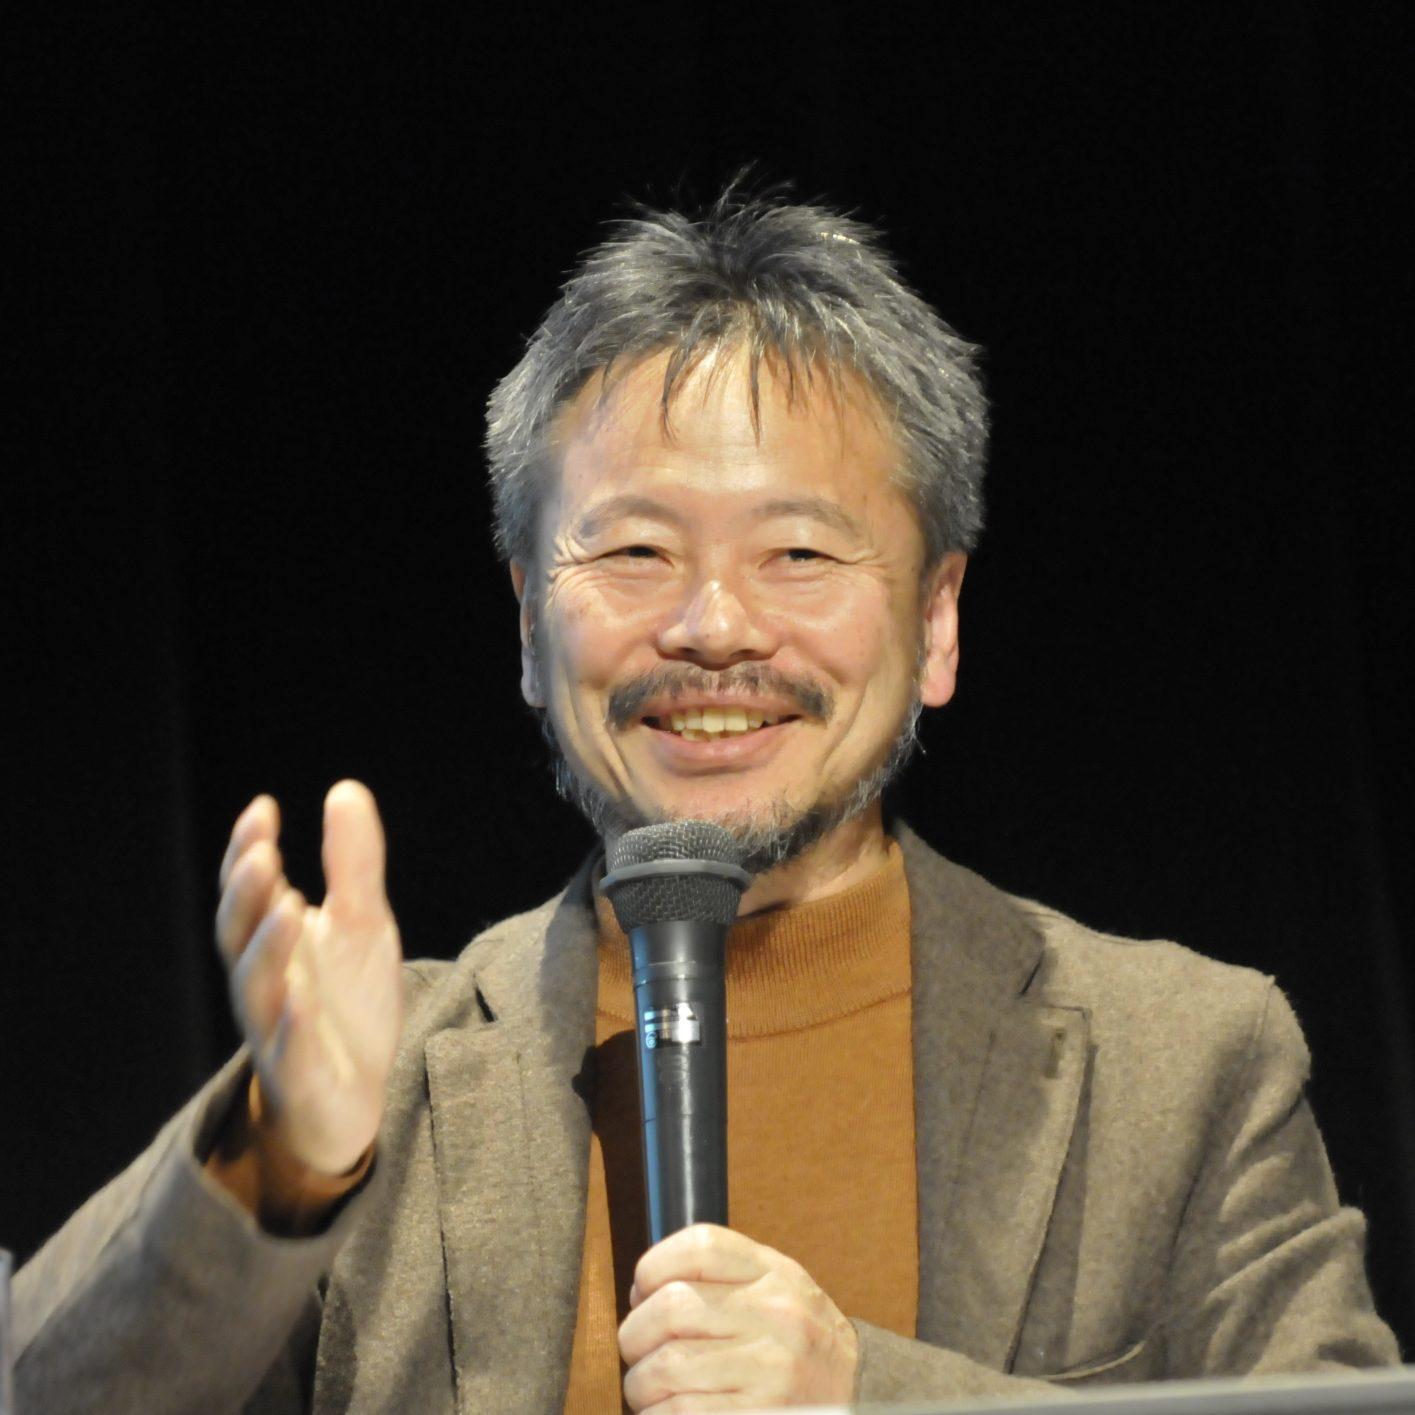 Isami Kinoshita, Professor, PhD, Chiba University, Japan